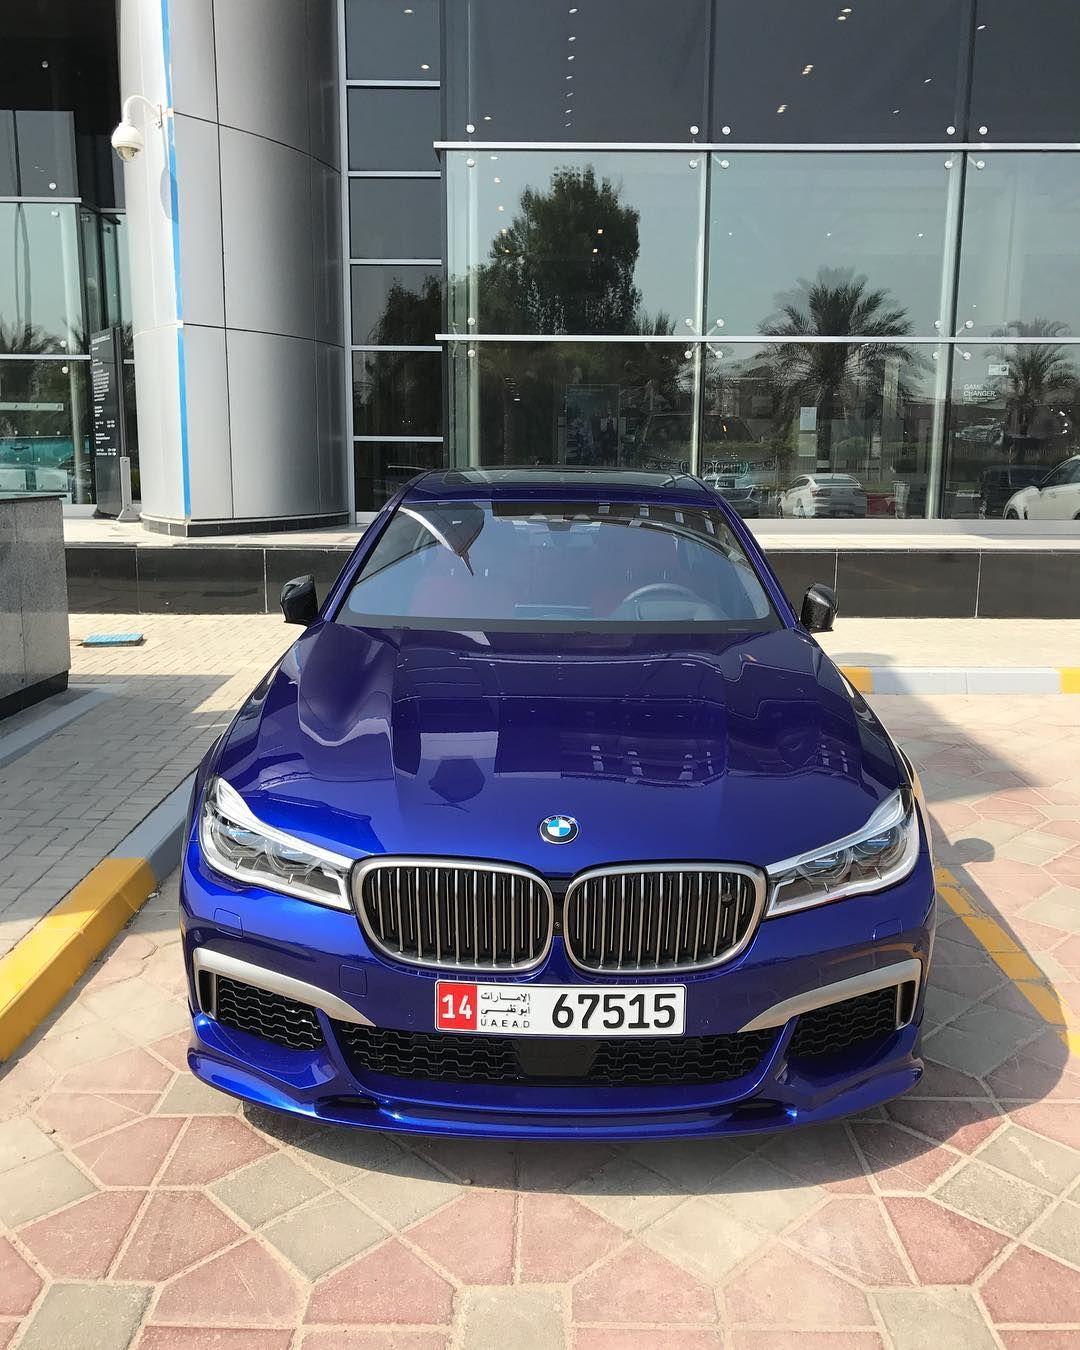 Rami Nasri Bmw Mini Rr Abudhabi Bmw On Instagram Bmw 760li M Sport Full Individual San Marino Blue Inside Red V12 6 6 Li Bi Turbo 6 Bmw Bmw Car Turbo